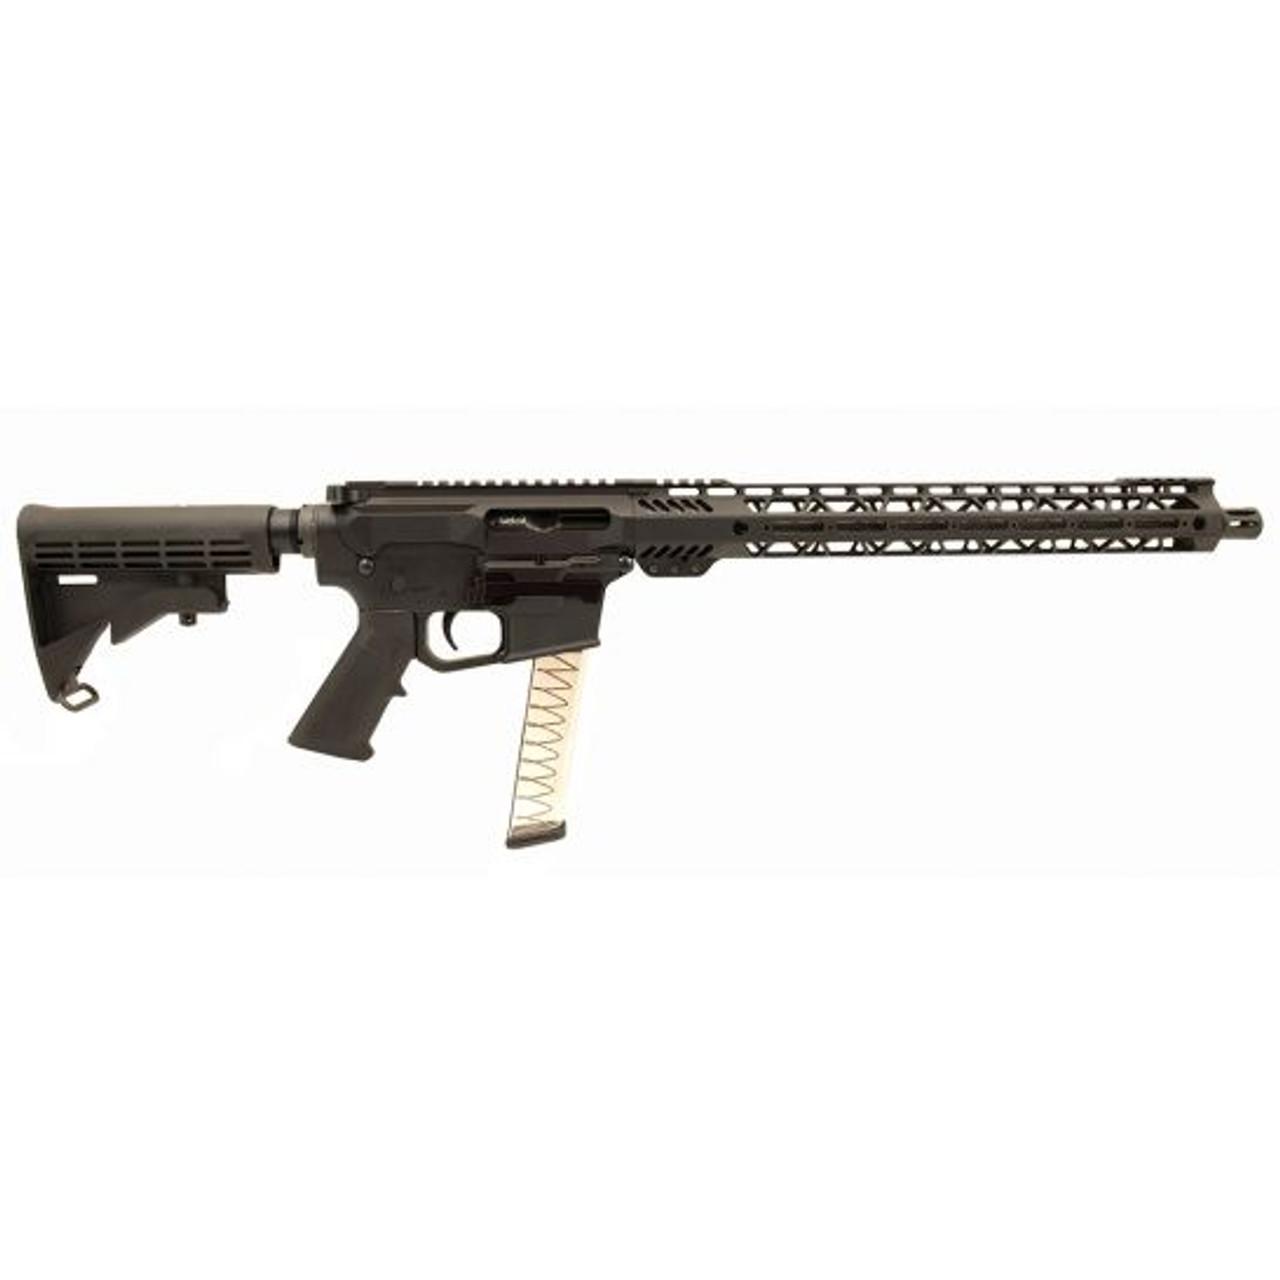 Palmetto State Armory PX9 Gen4 CALIFORNIA LEGAL - 9mm